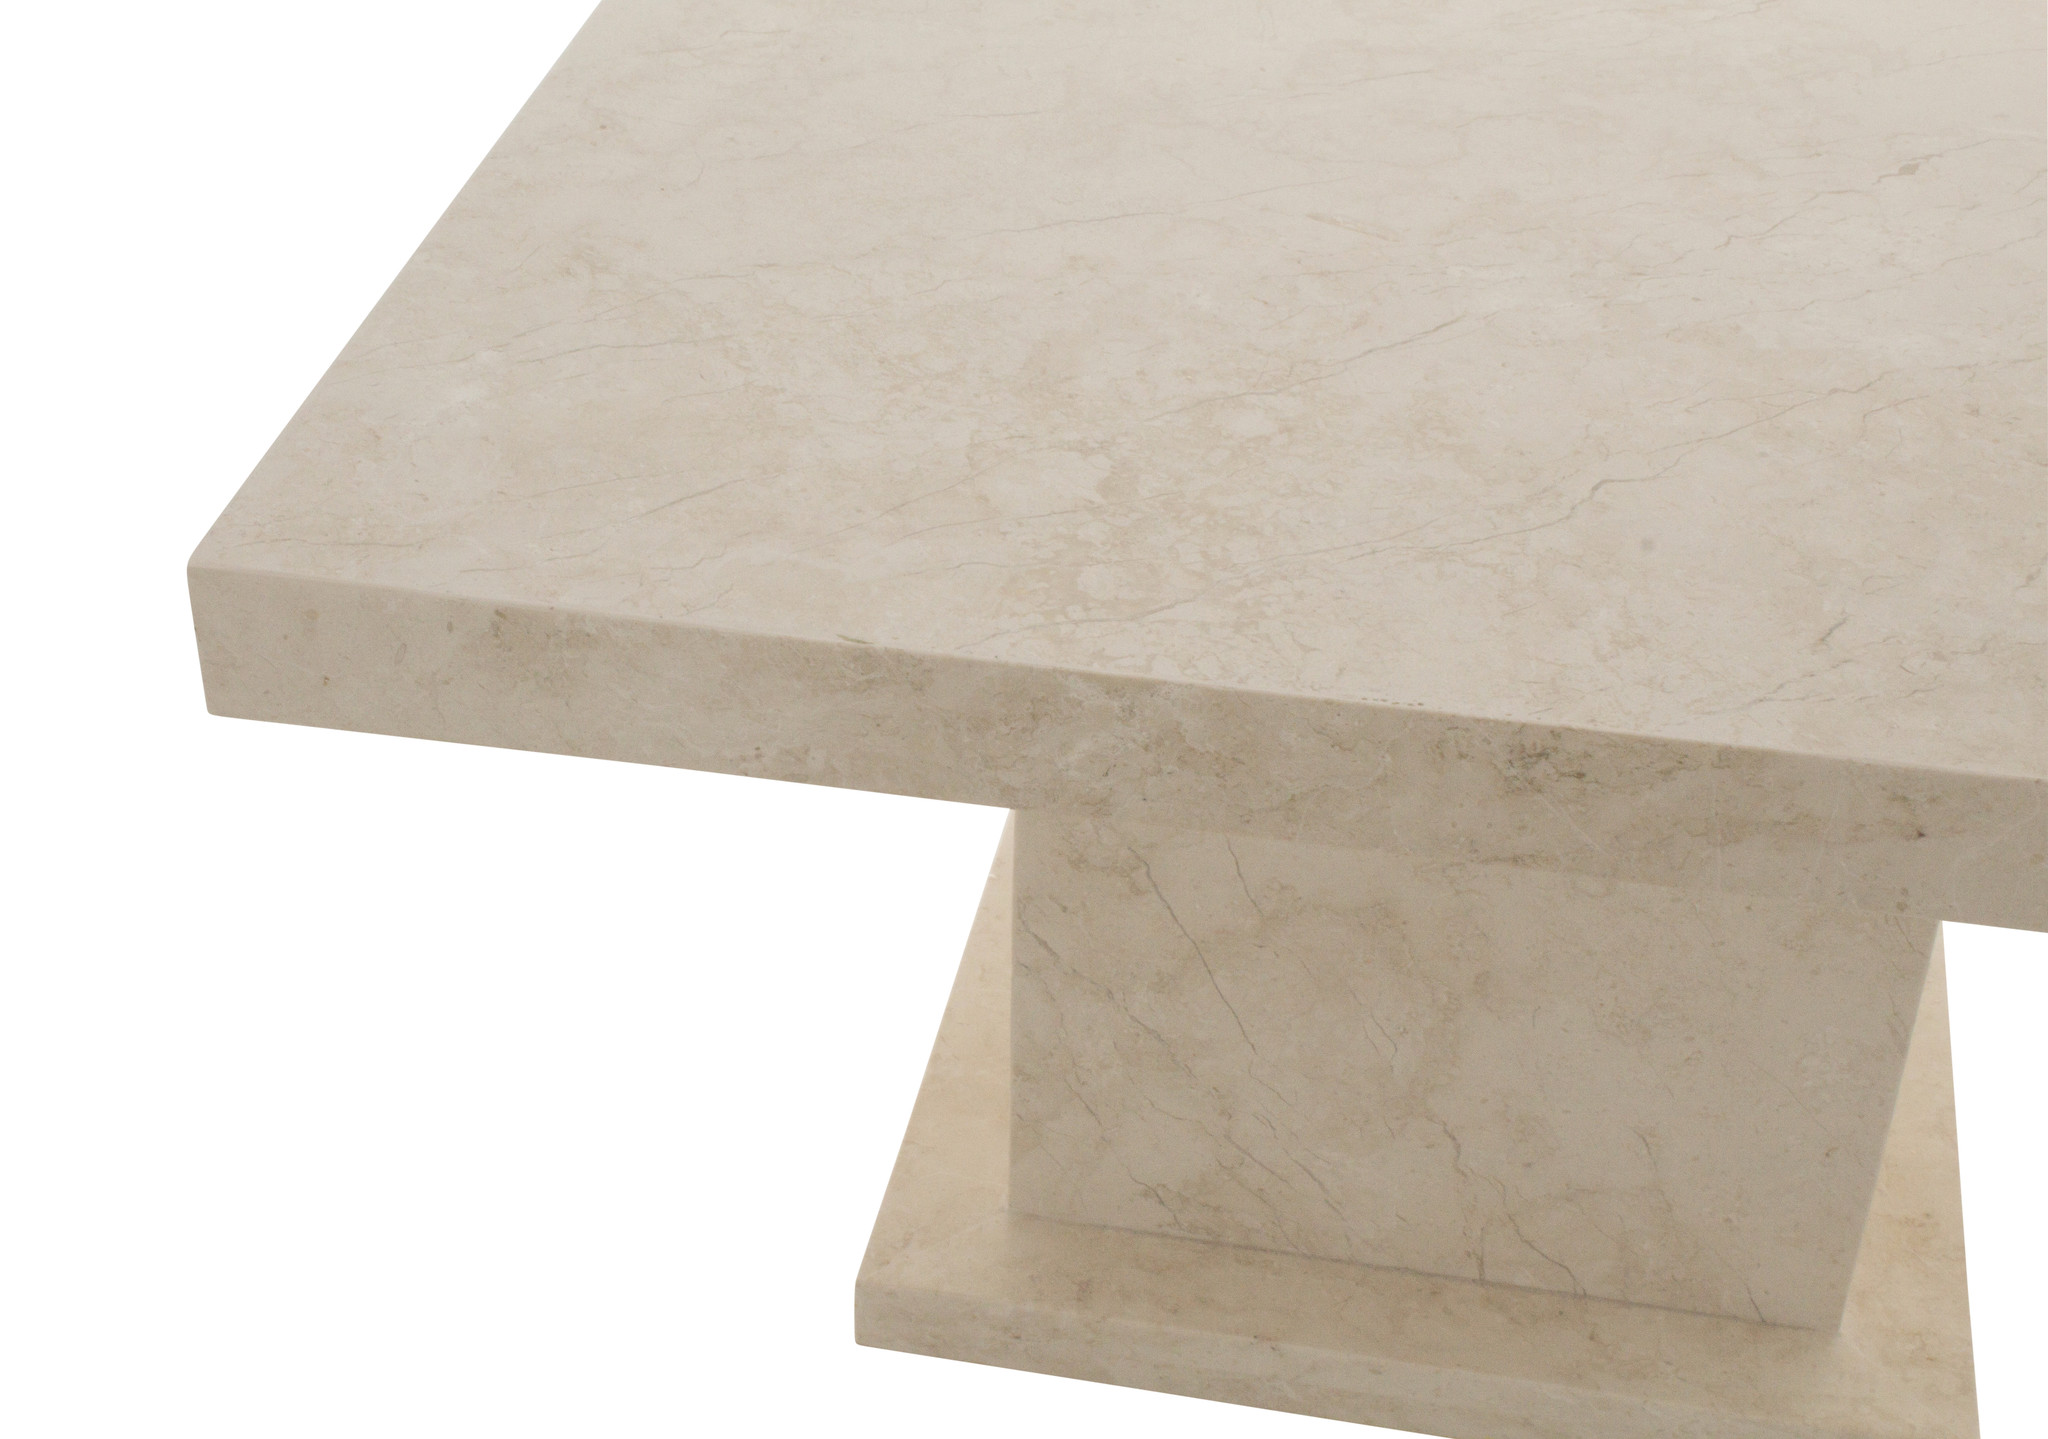 Indomarmer Couchtisch Quadrat 80x80x45 cm Creme Marmor